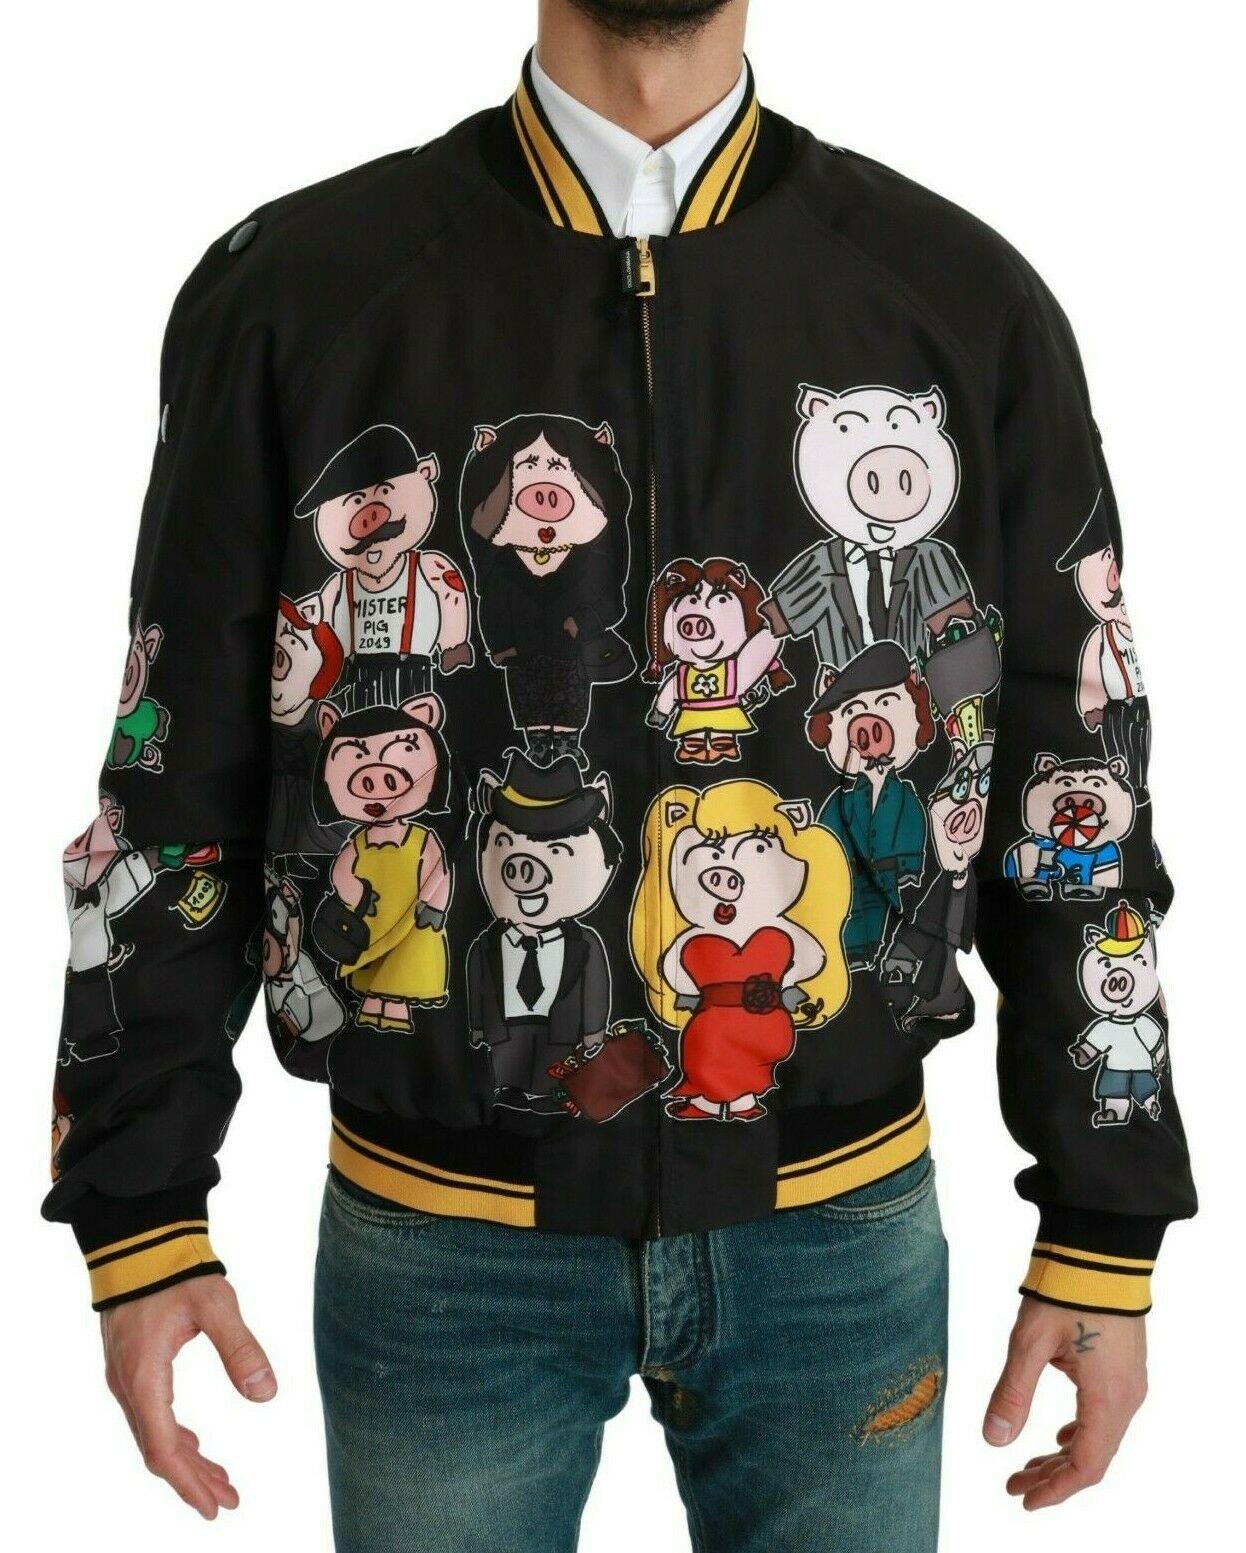 Dolce & Gabbana Men's YEAR OF THE PIG Bomber Jacket Black JKT2609 - IT44 | XS